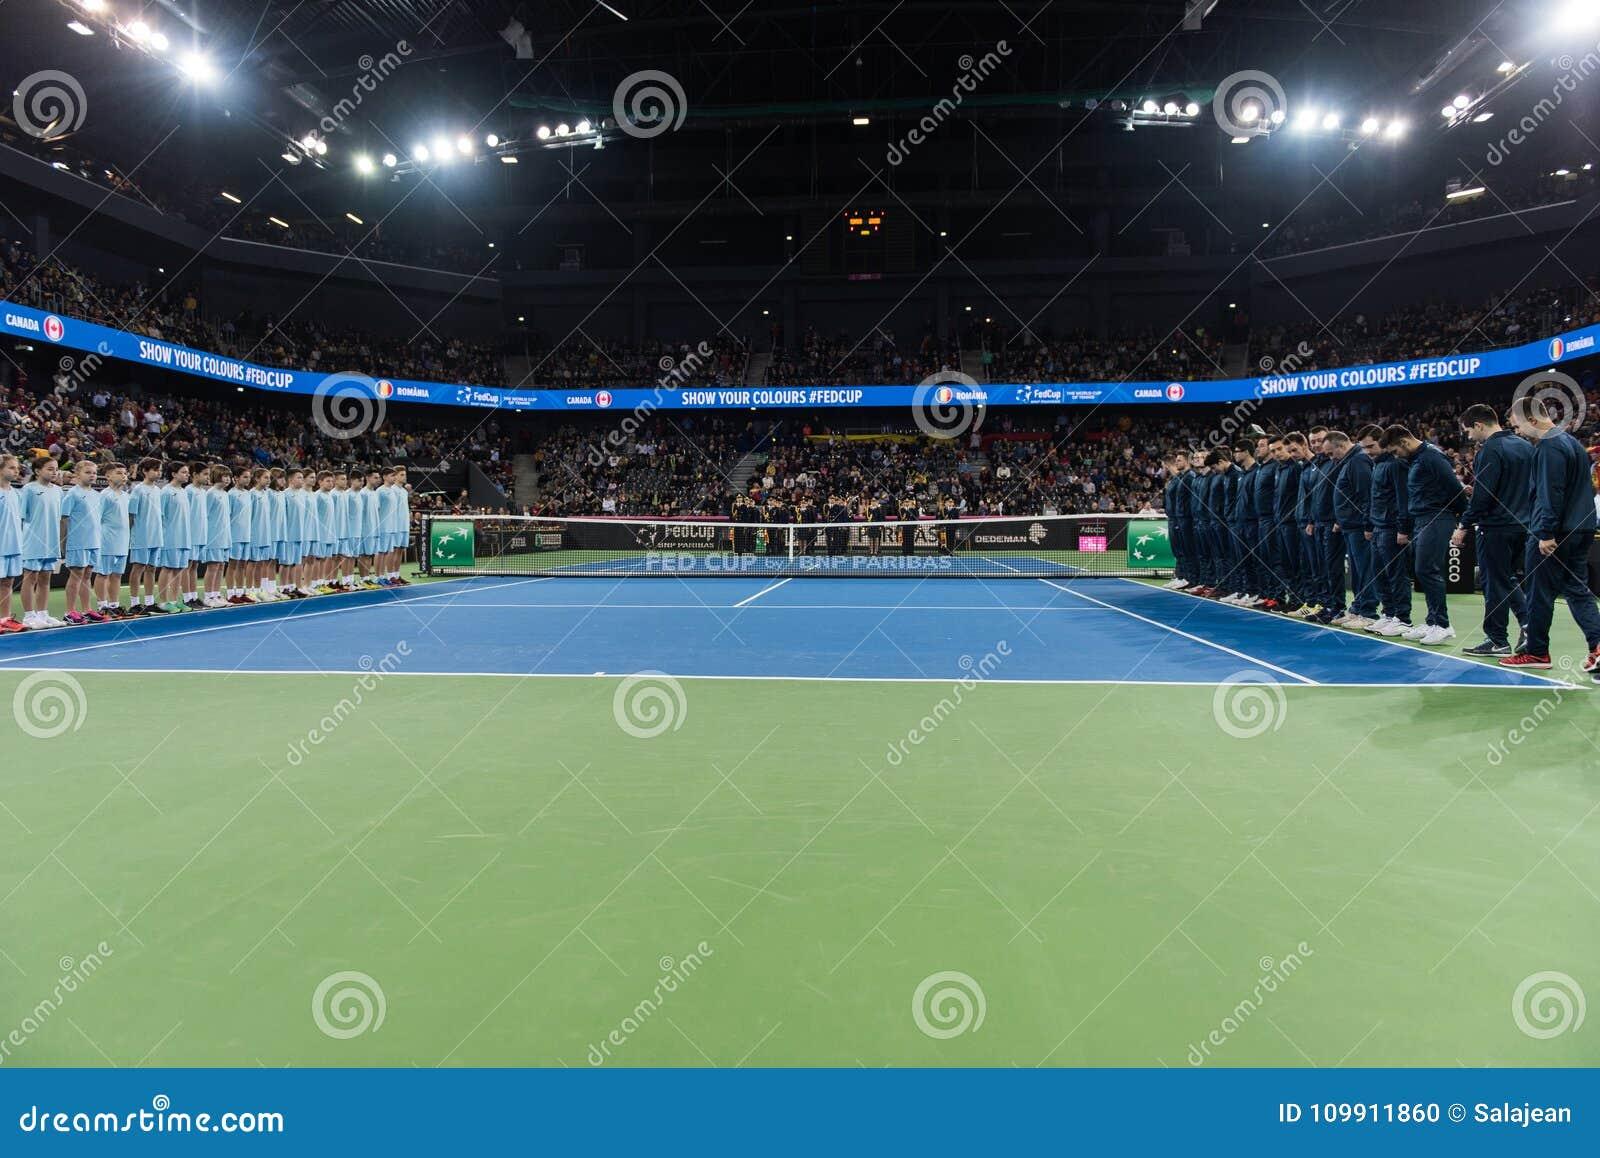 Tennis match opening ceremony